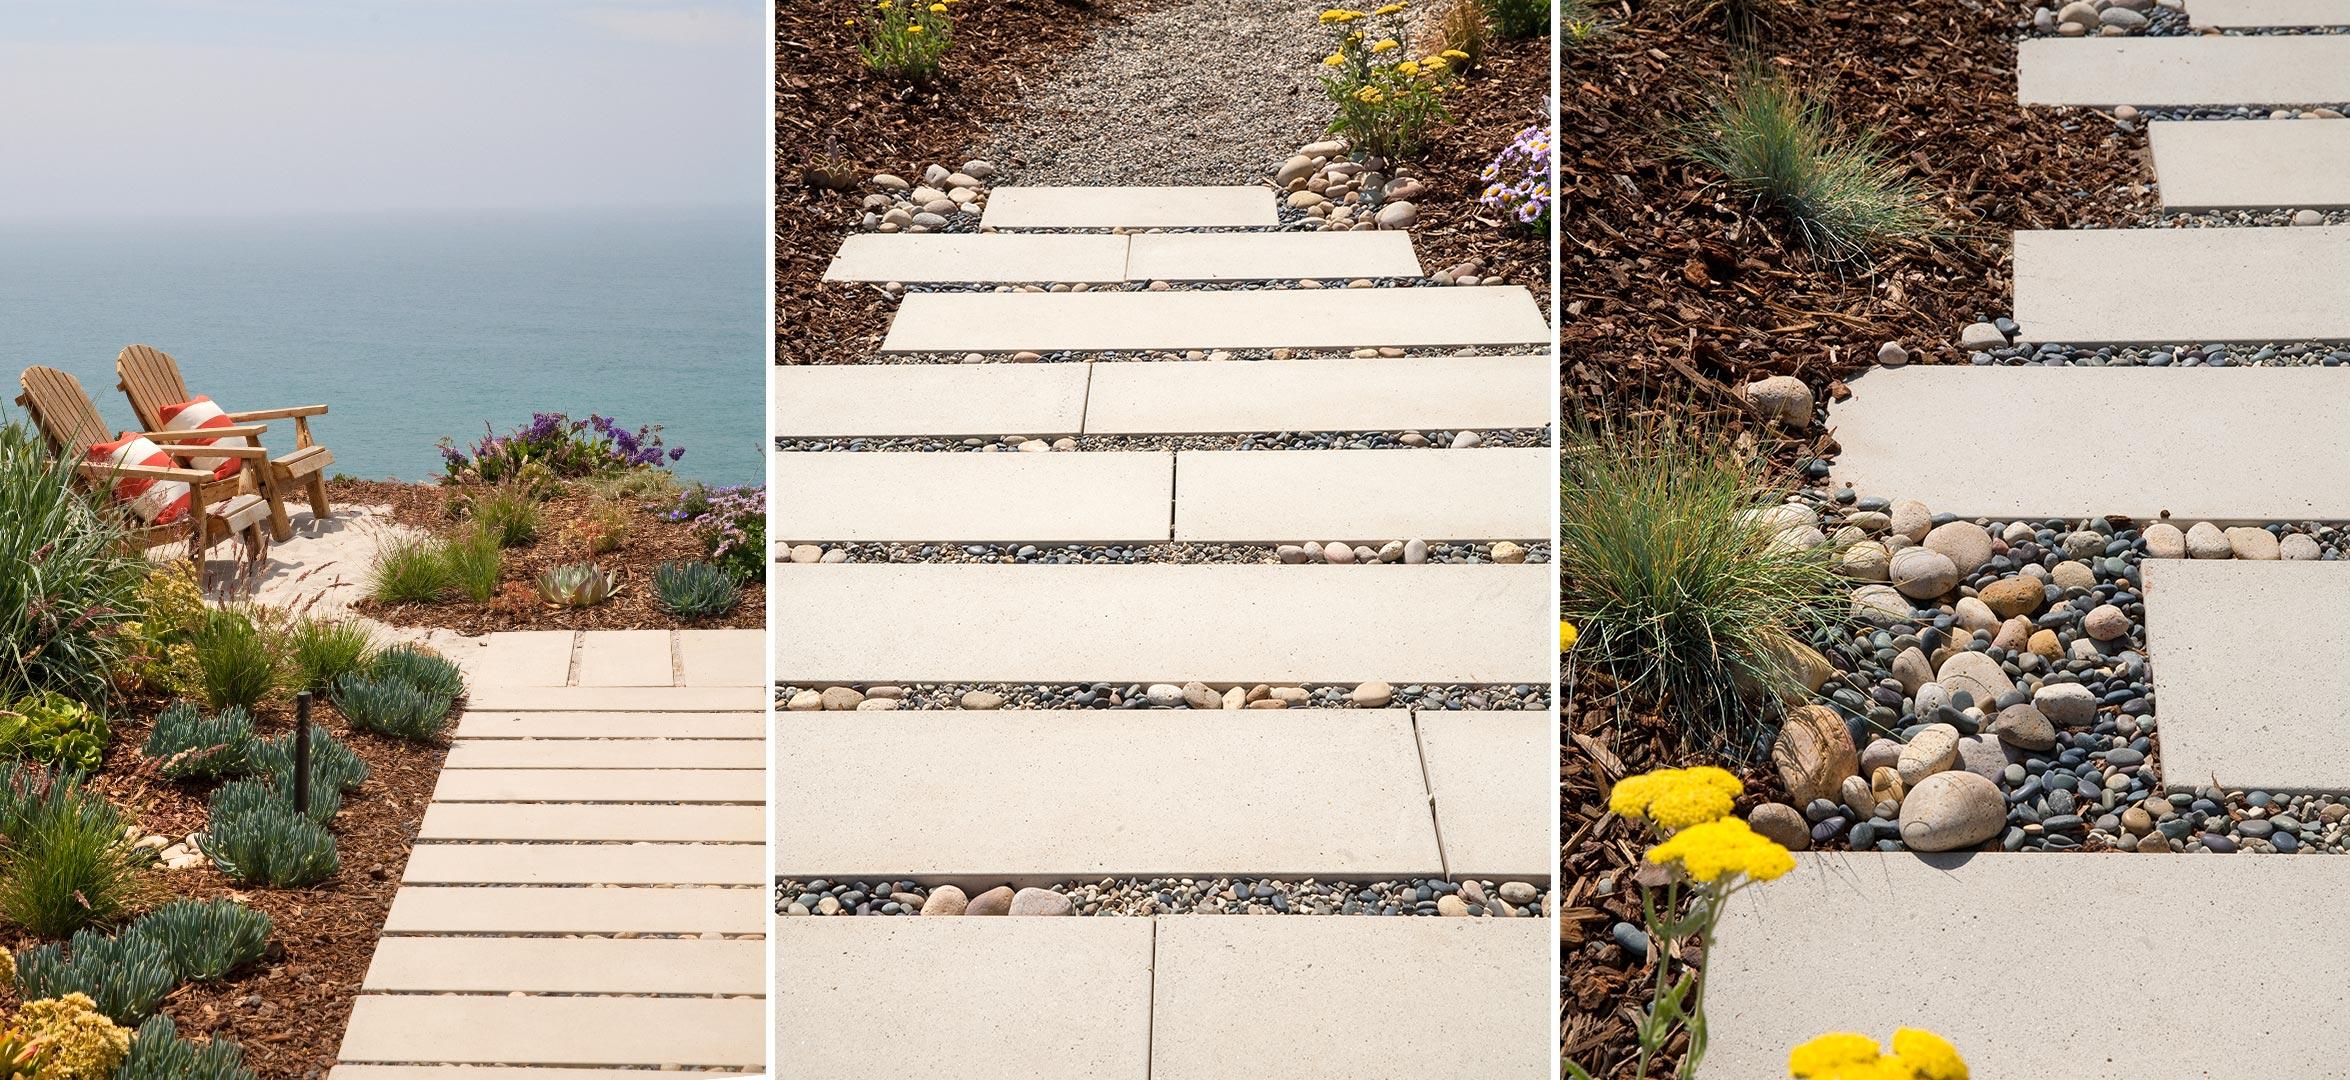 06-concrete-pavers-paths.jpg